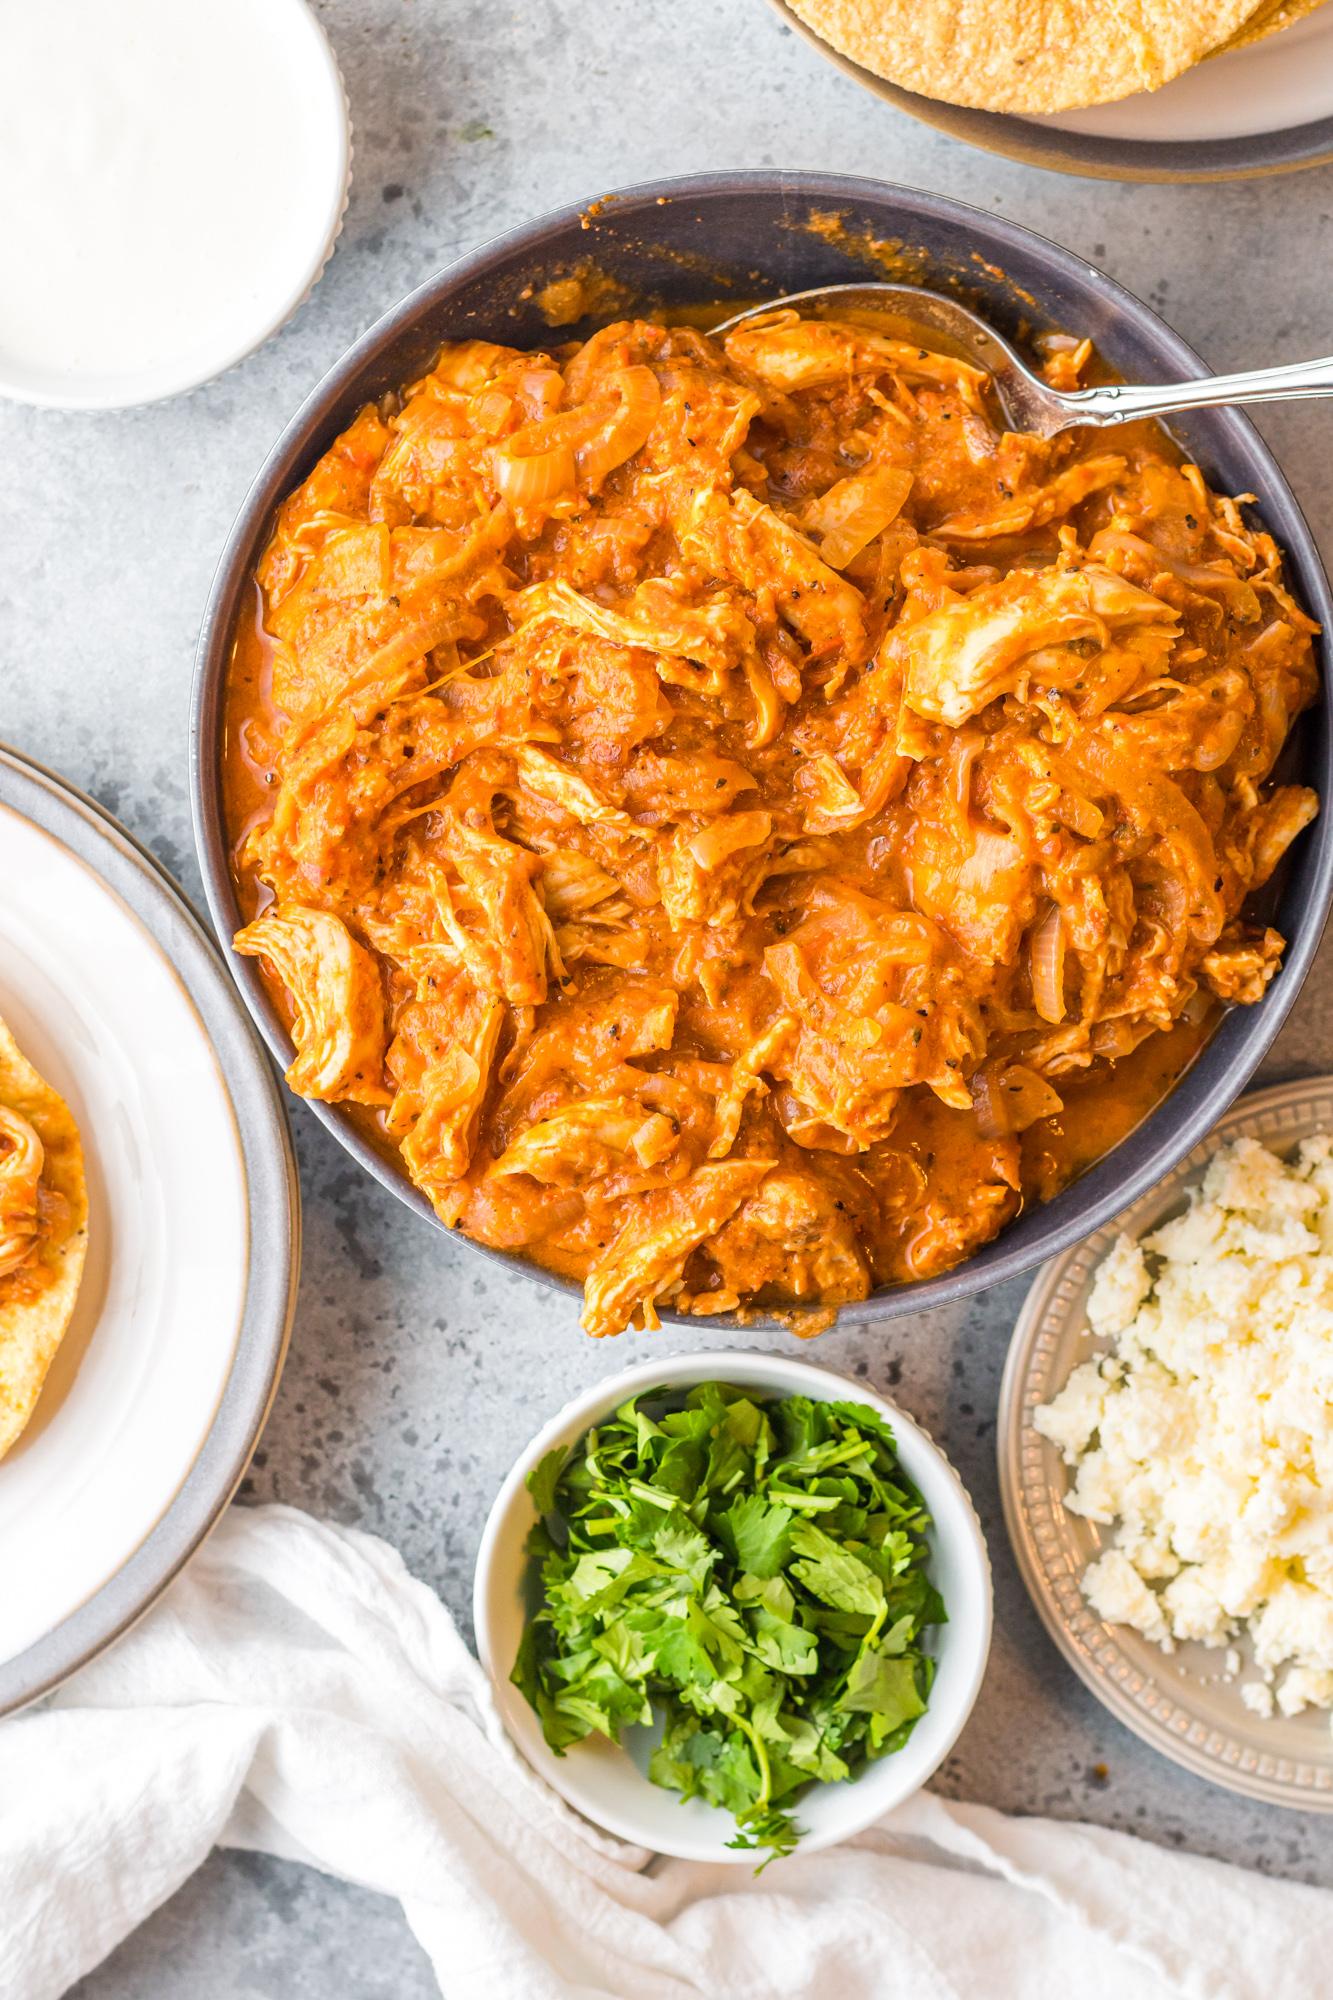 Chicken Tinga Recipe with cilantro and rice.